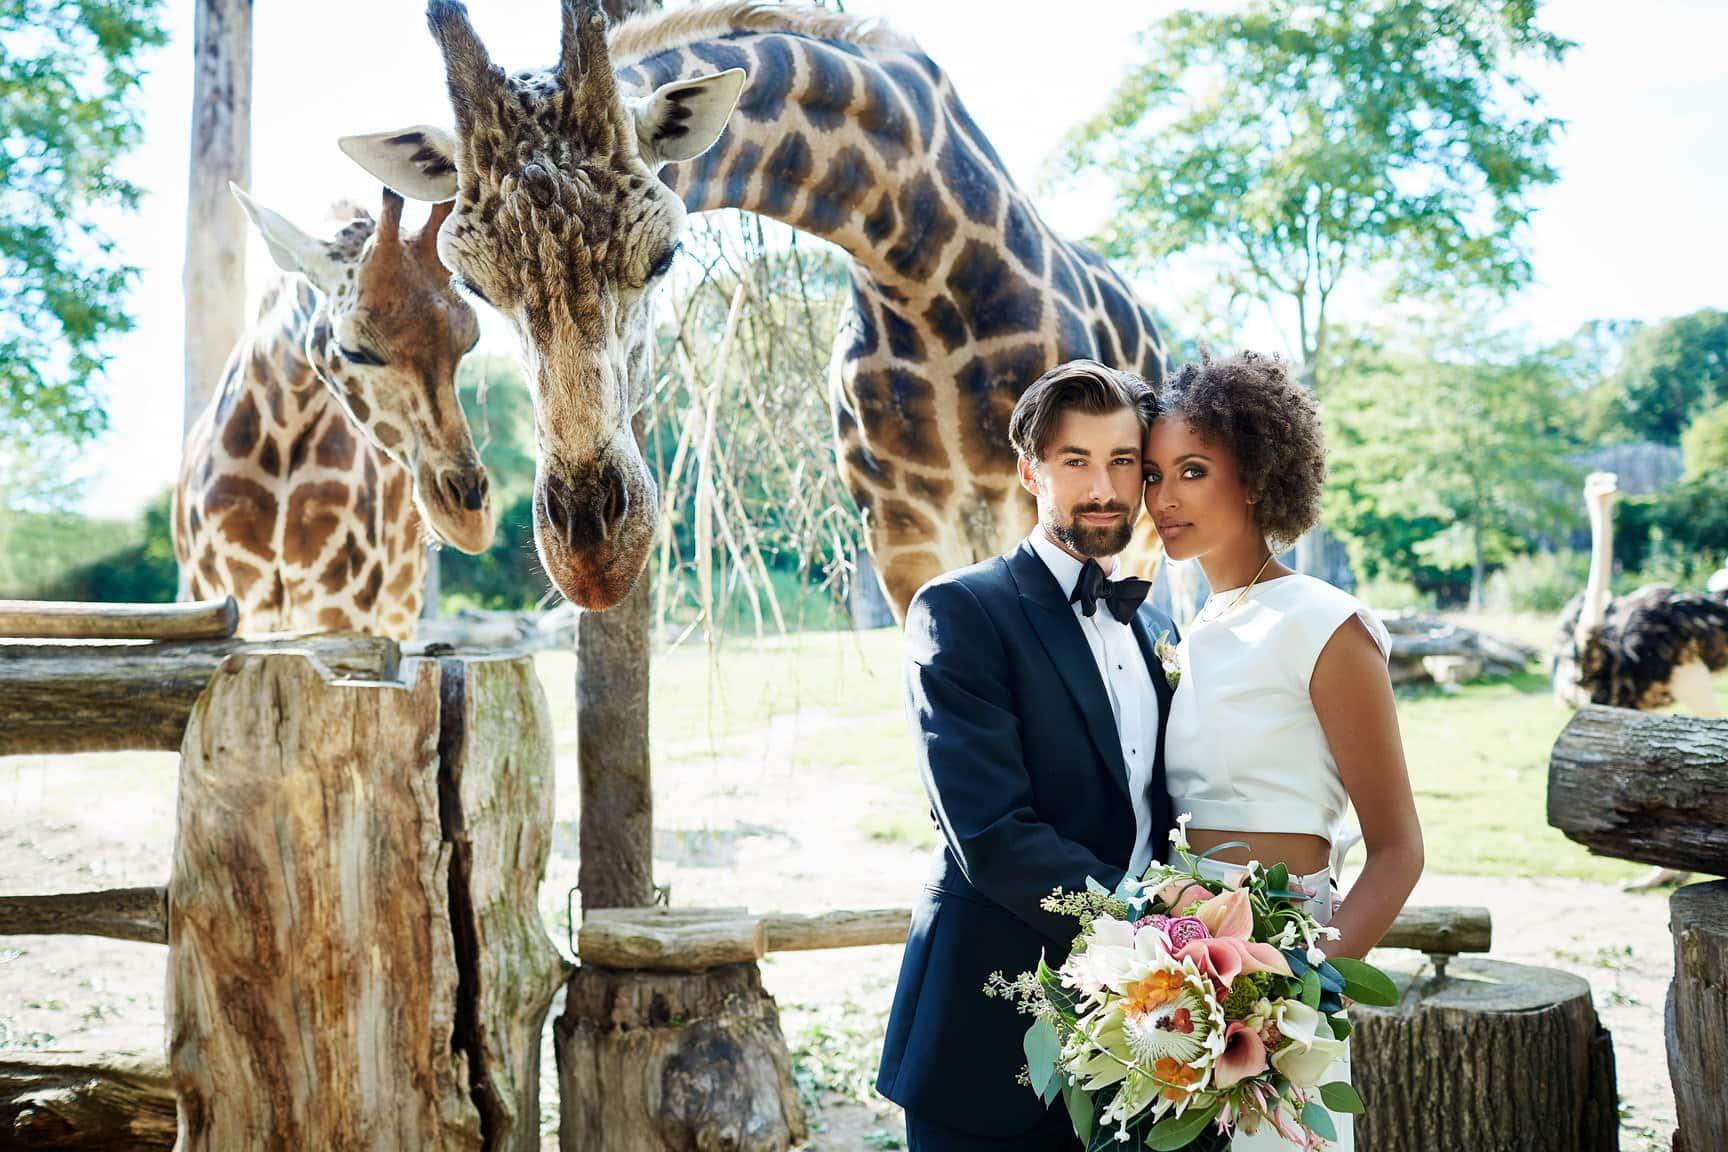 Zaneta Mode in Leipzig - Hochzeiten & Feiern